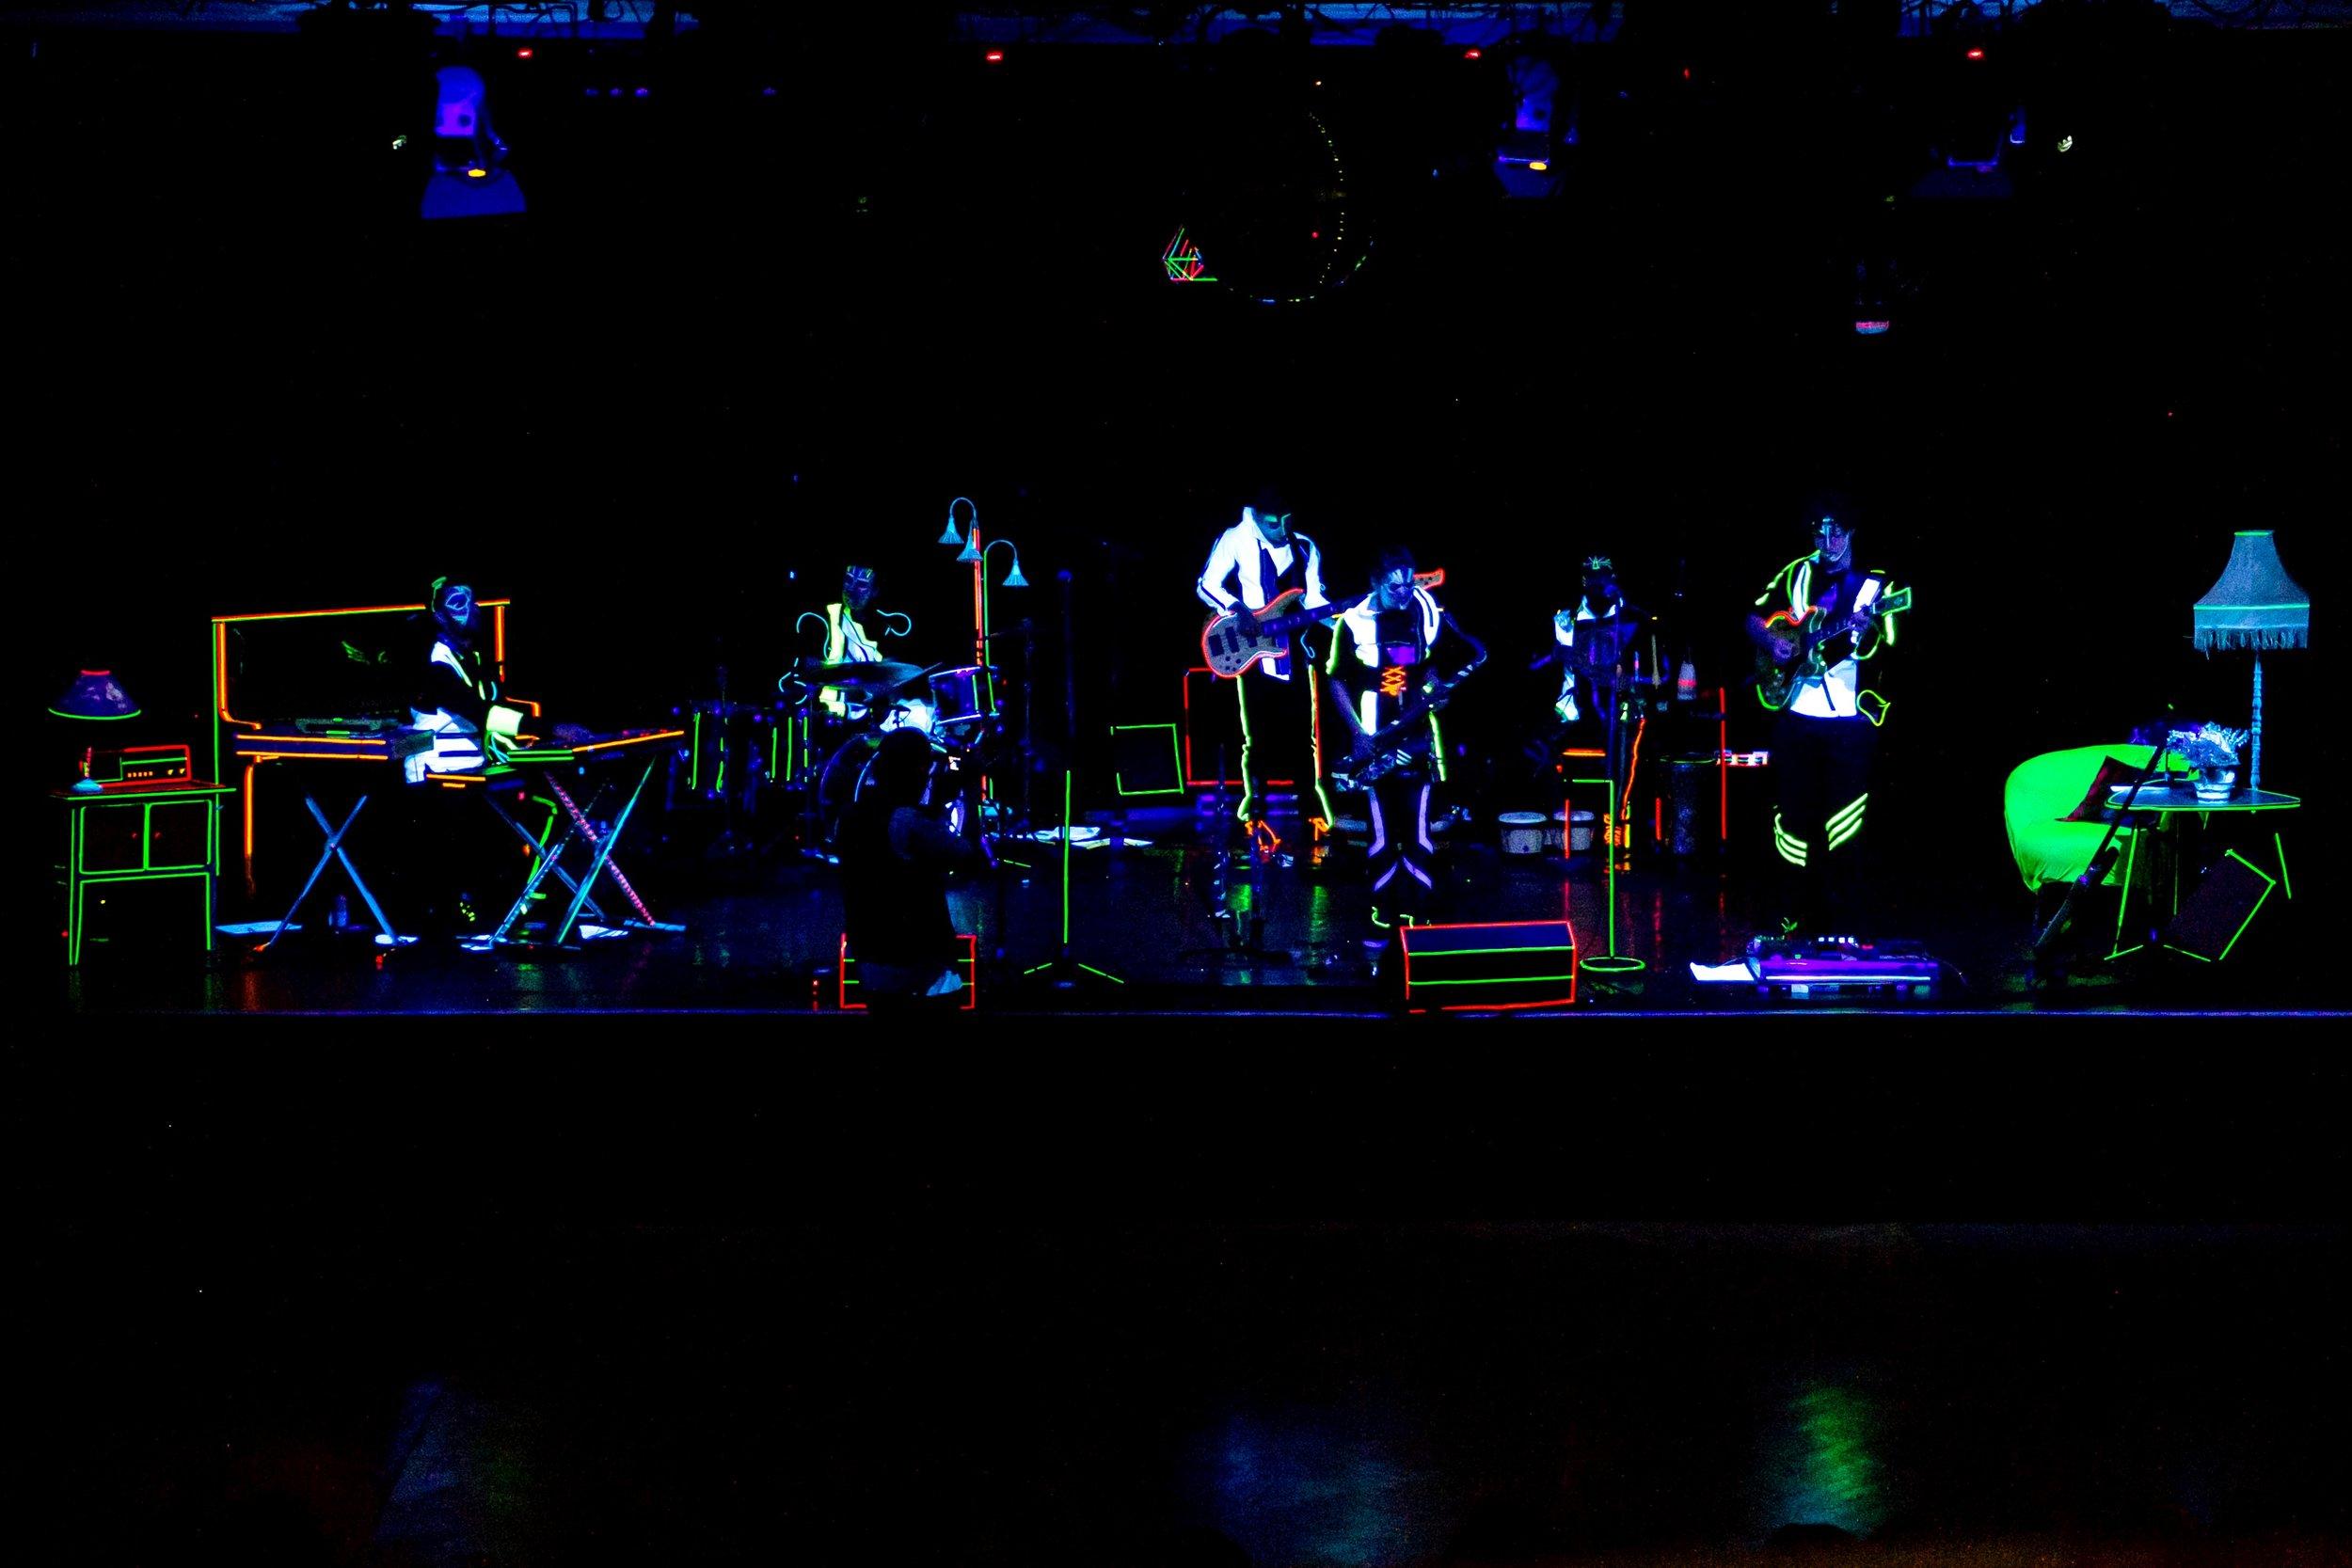 UV_Full_Stage_Fotor.jpg